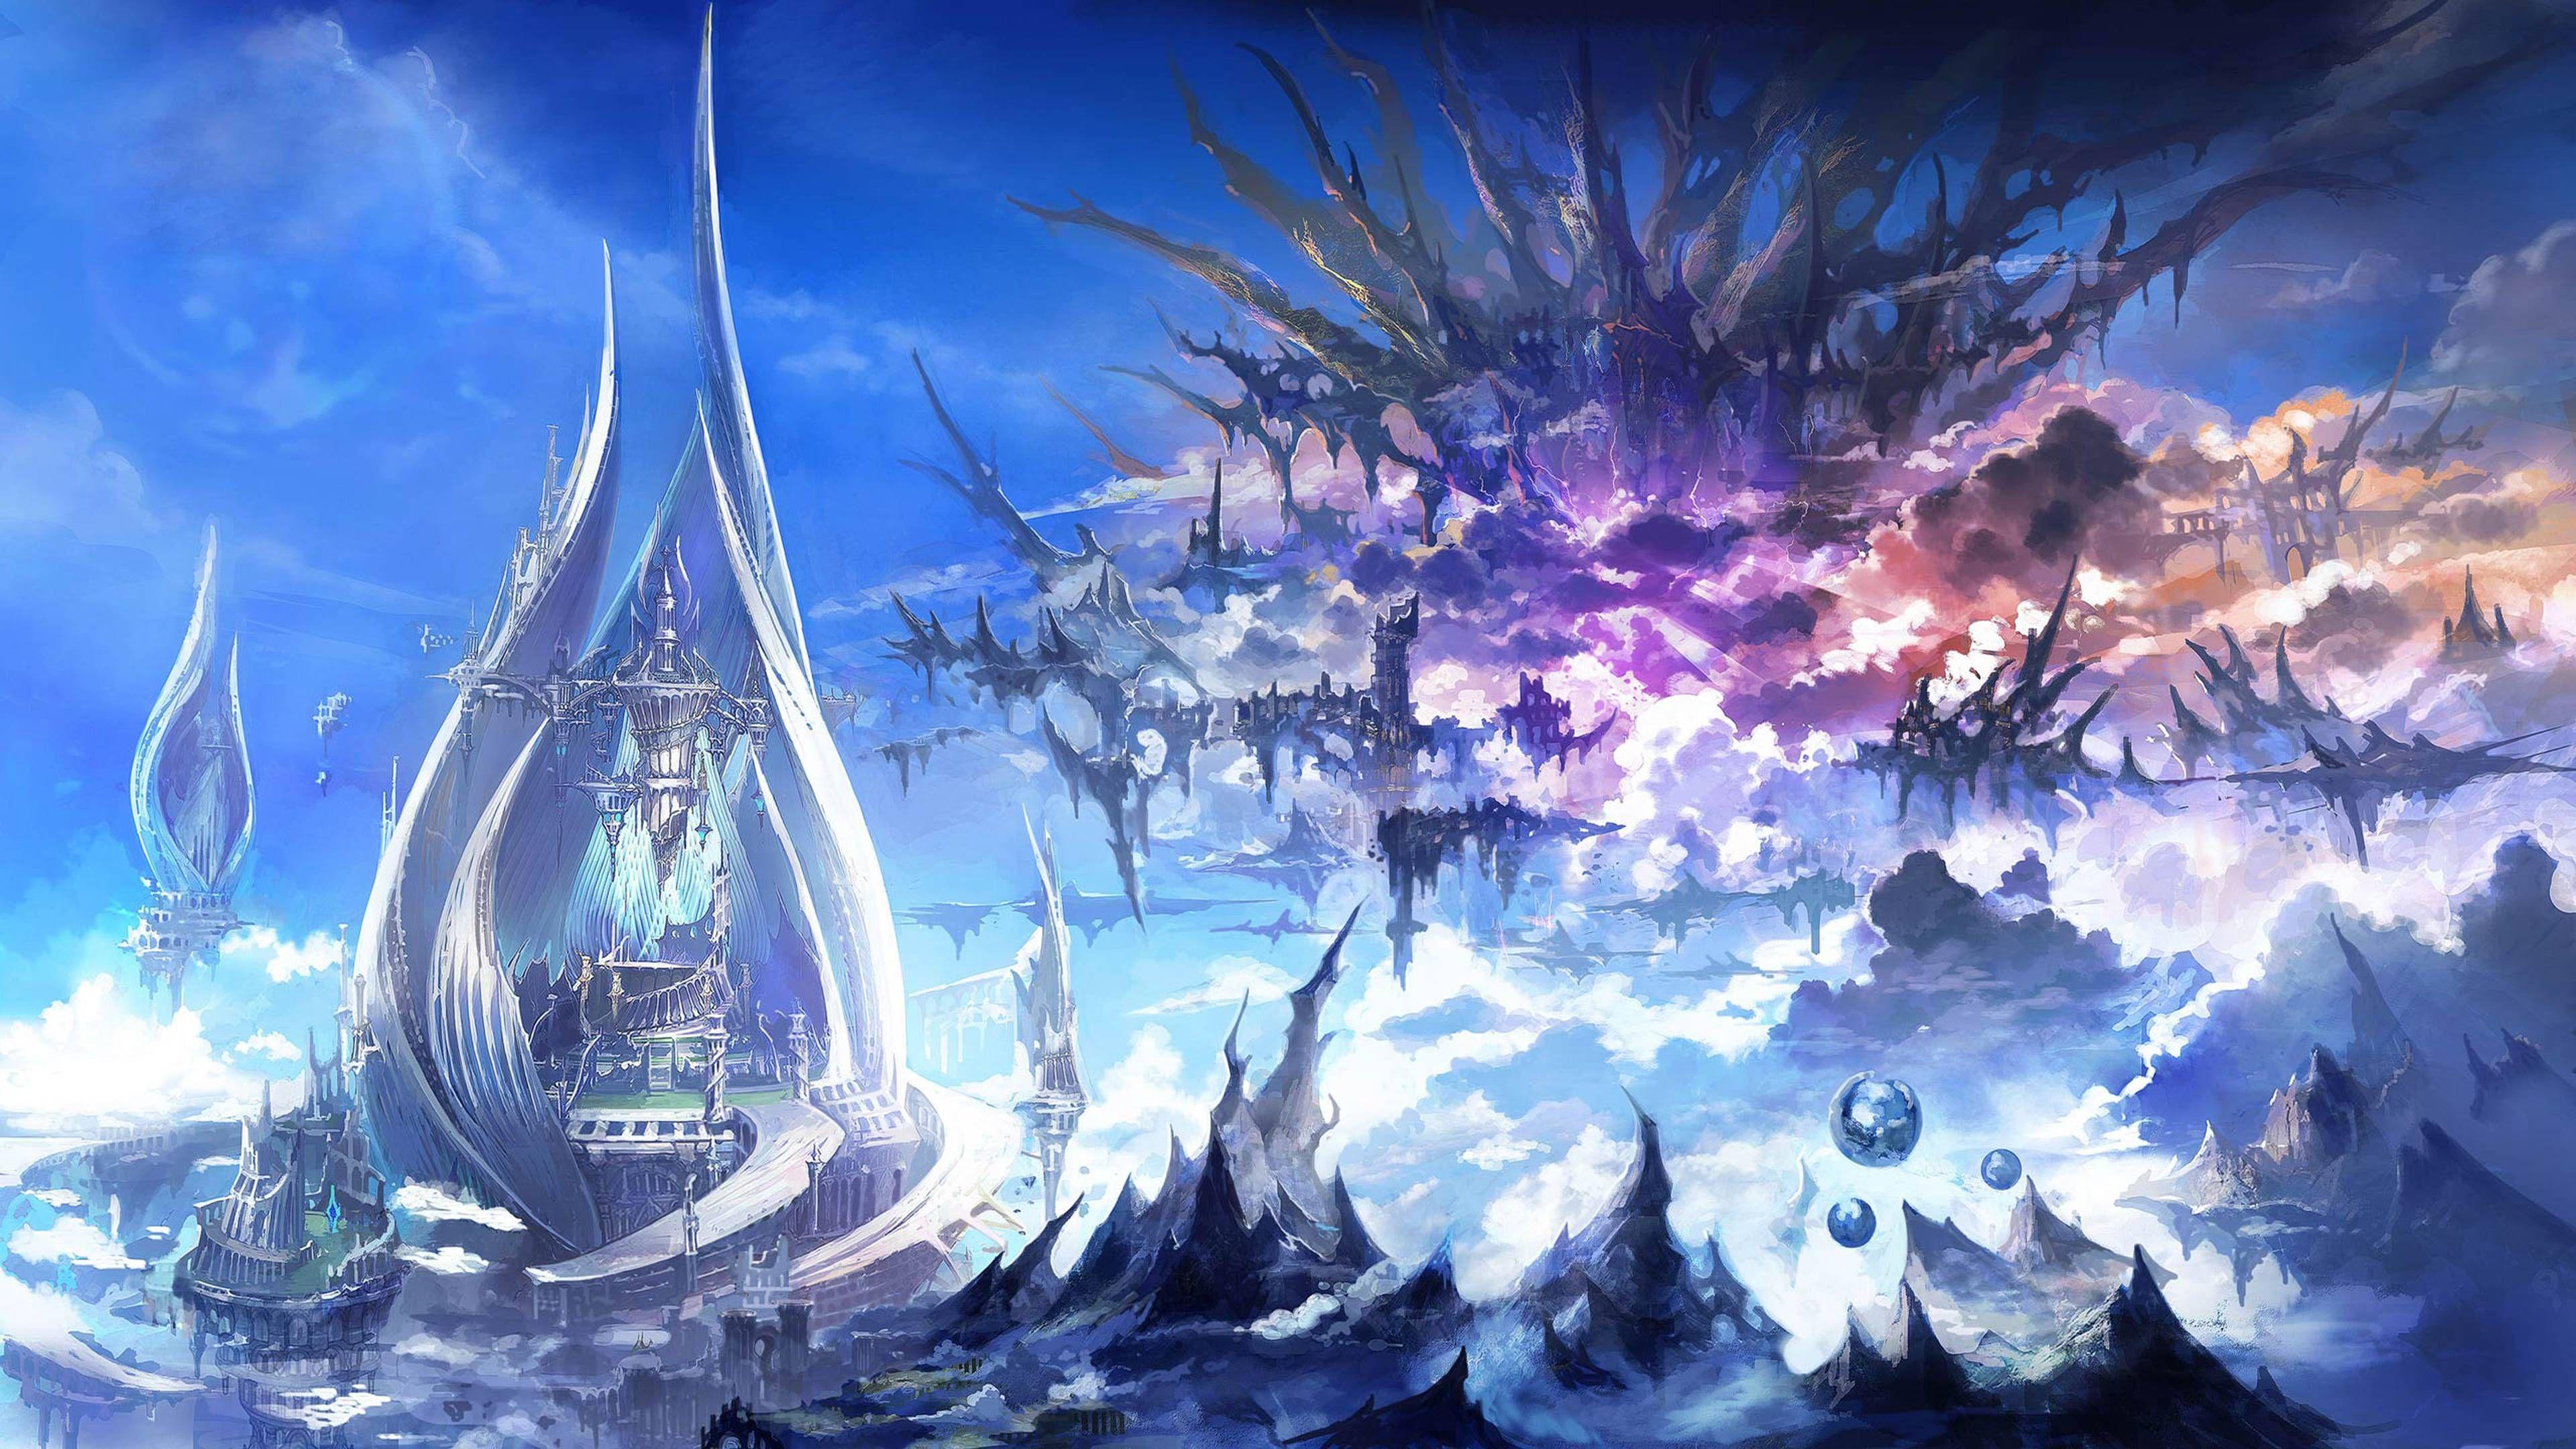 Final Fantasy 14 Heavensward Wallpapers Mobile Fantasy Landscape